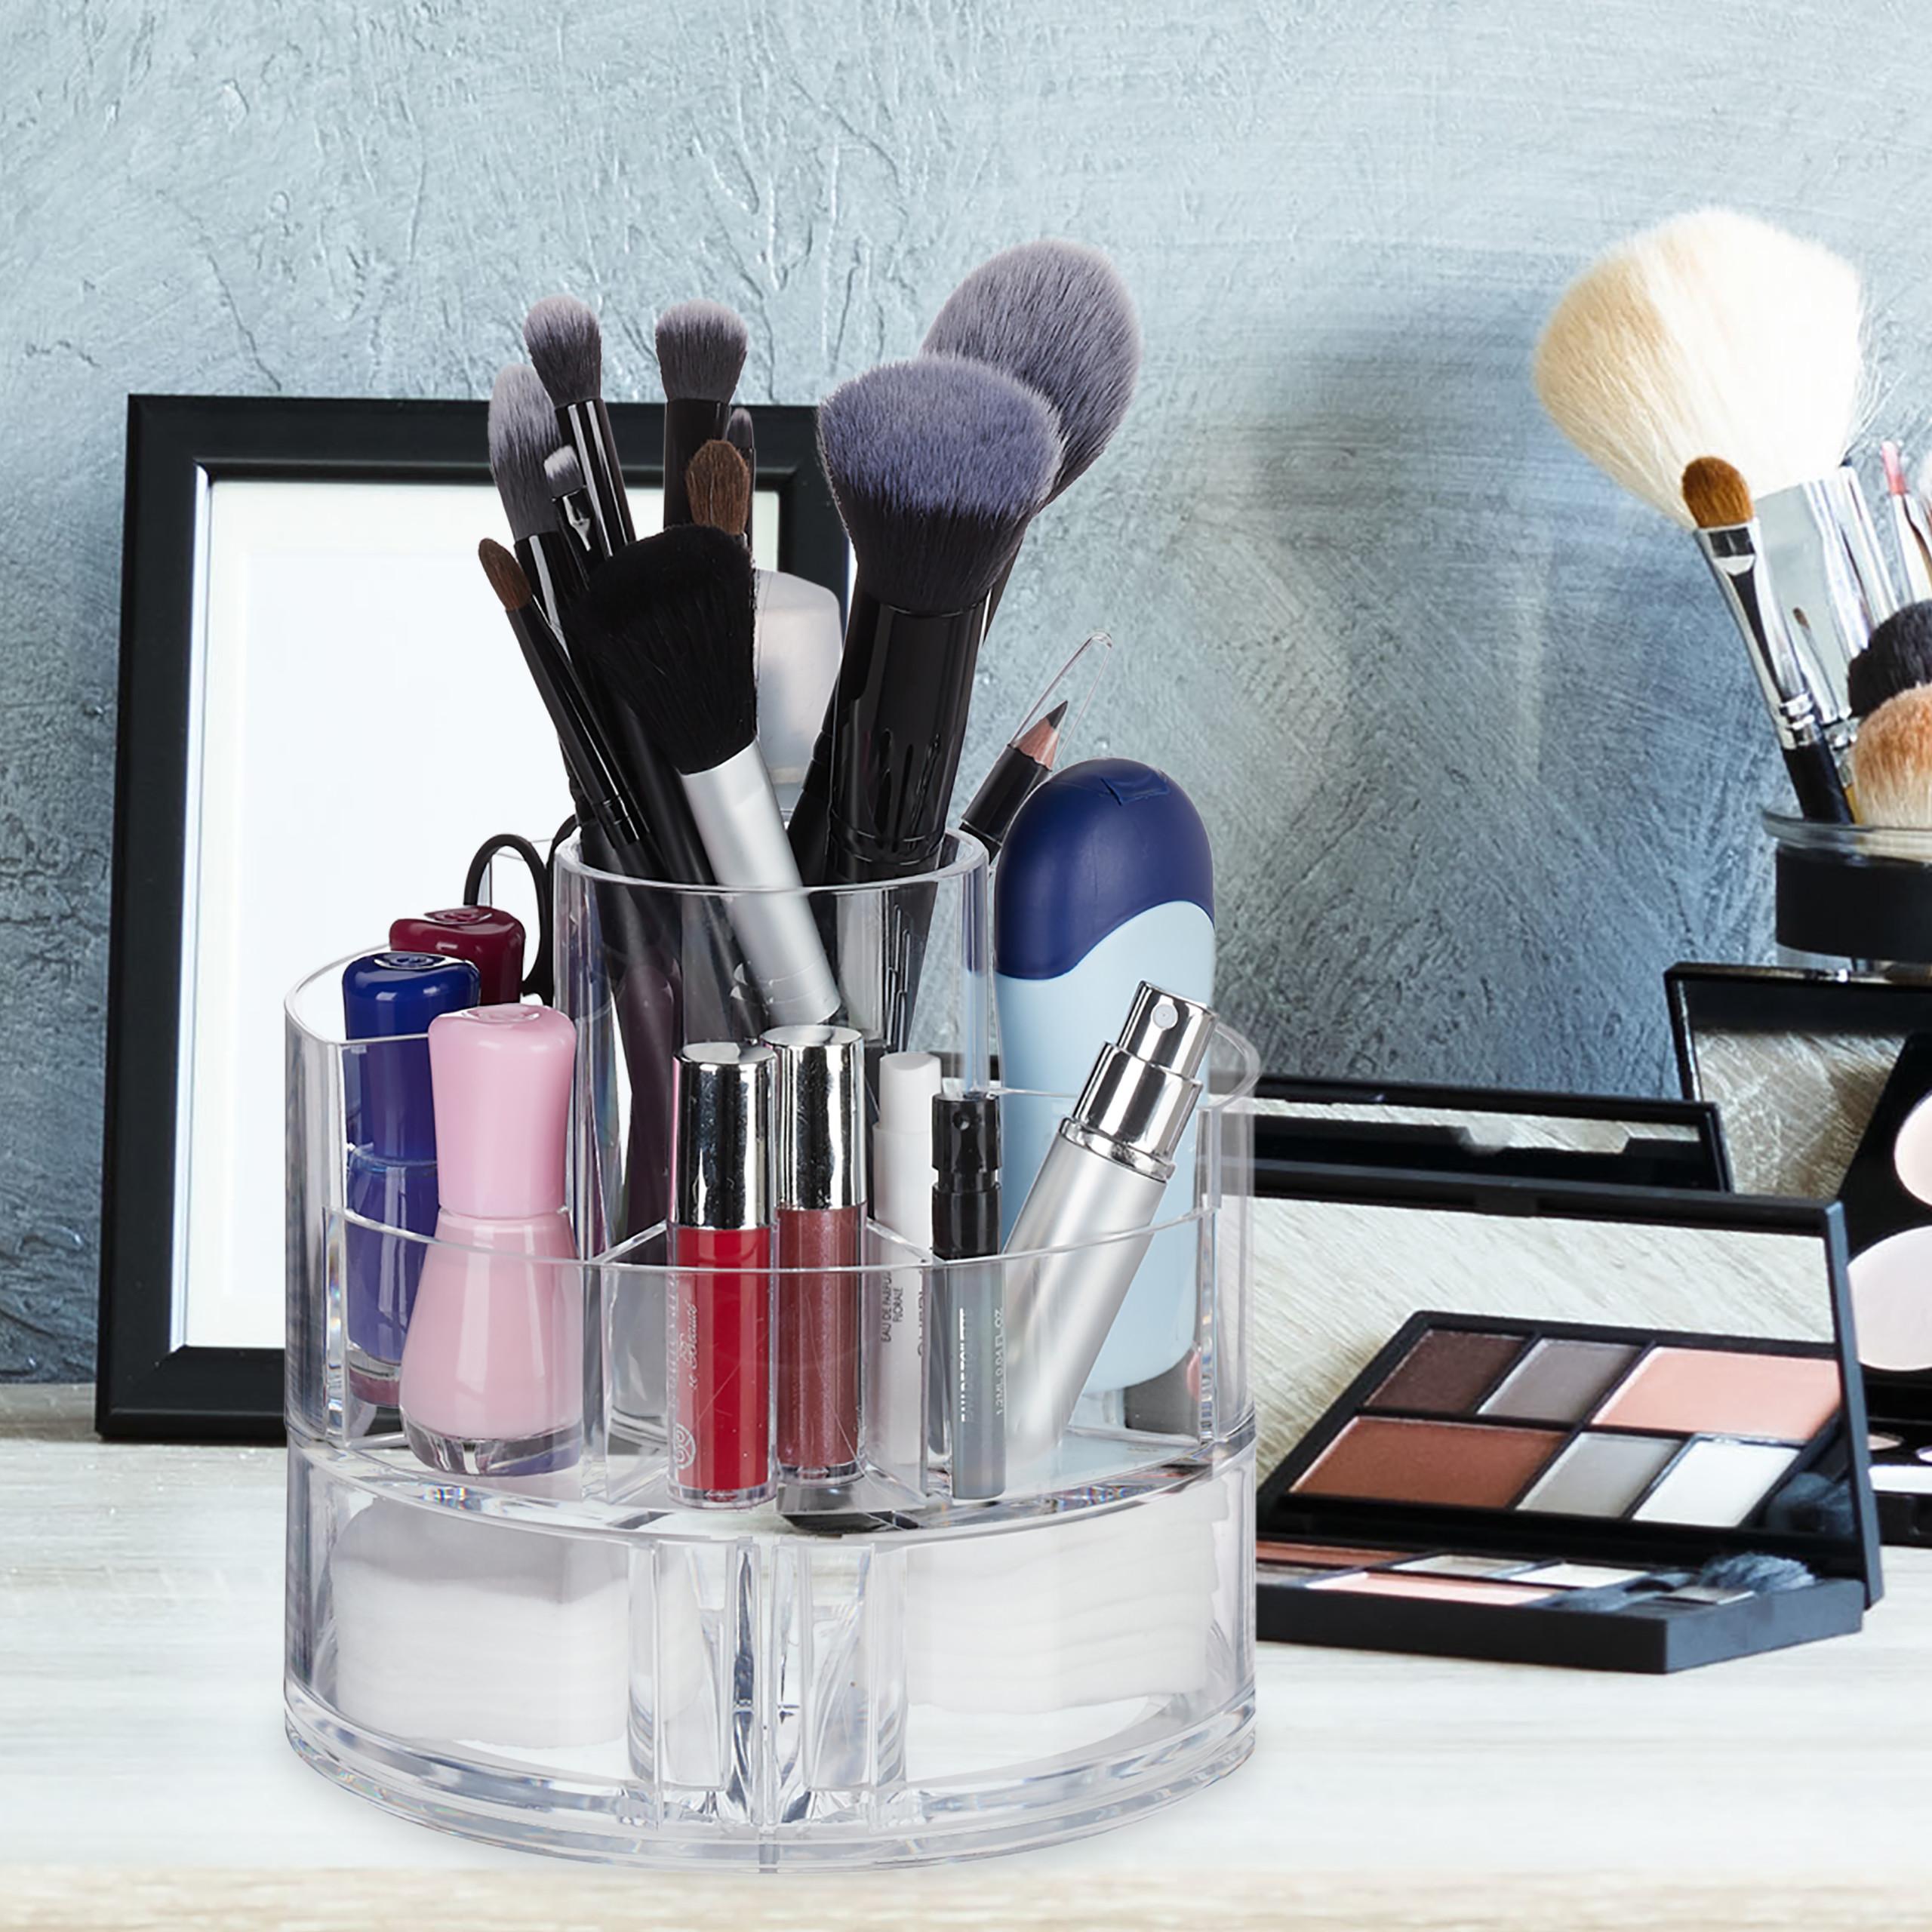 make-up-organizer-acryl-rond-cosmetica-opbergen-opbergsysteem miniatuur 11